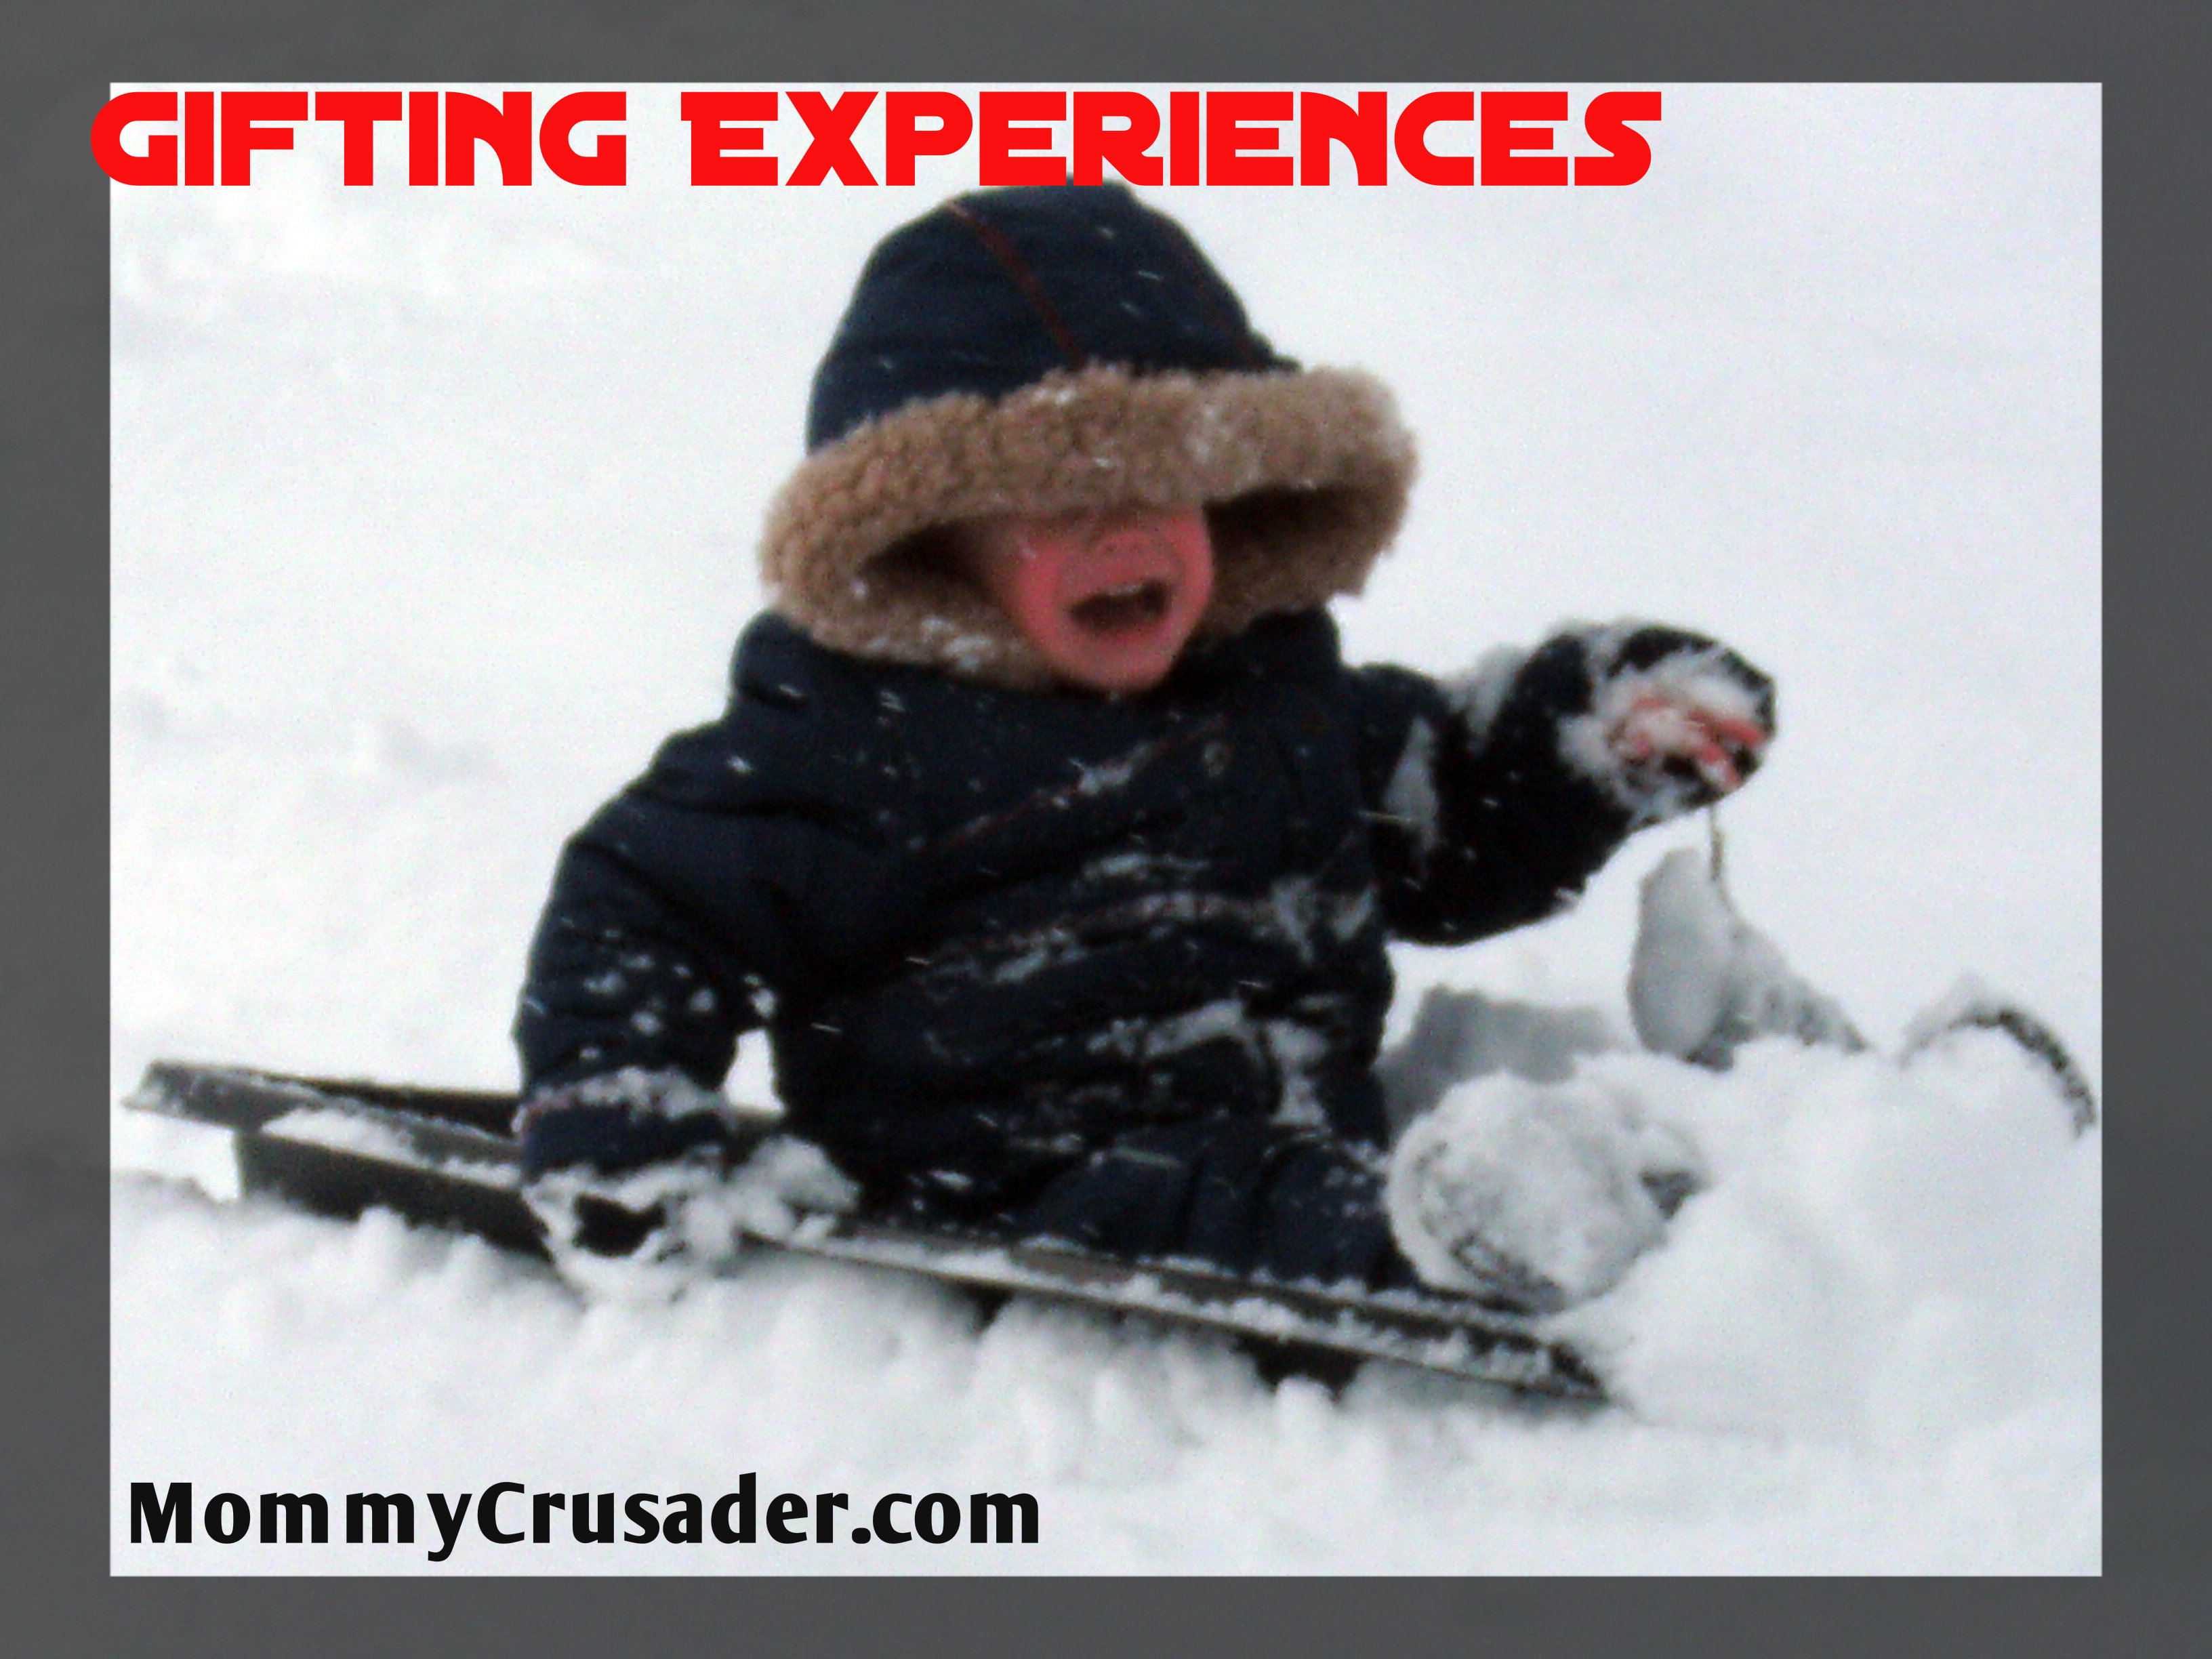 Gifting Experiences | MommyCrusader.com